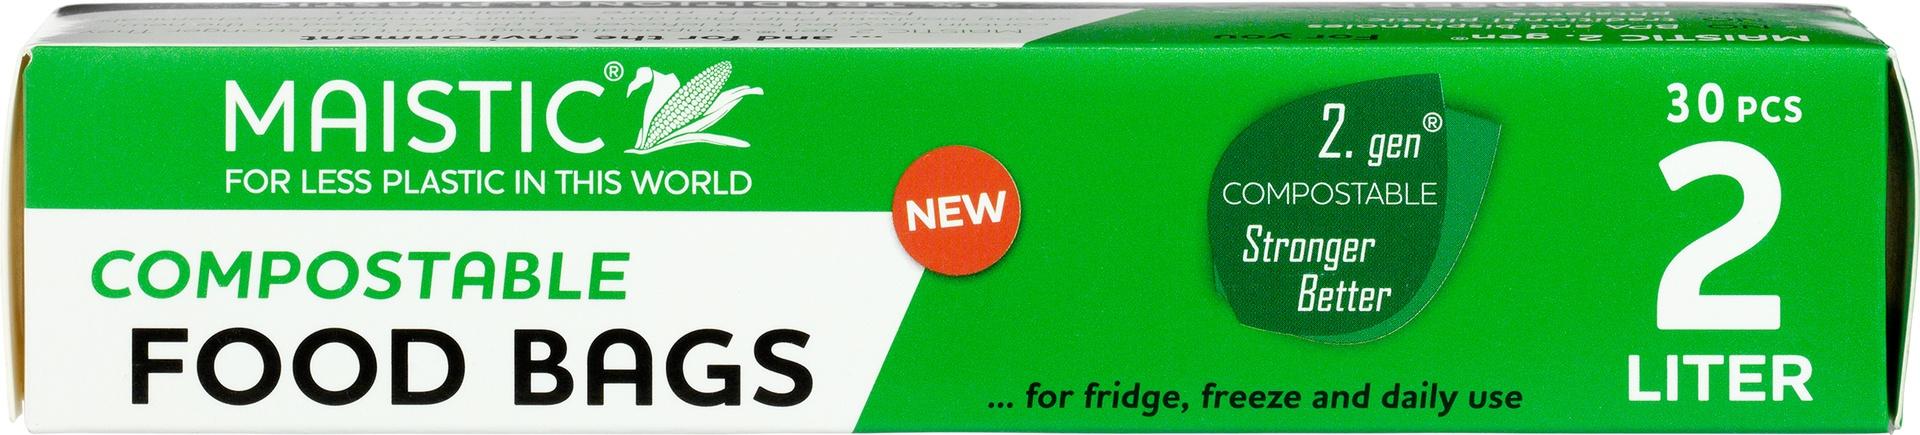 Biologische Maistic Diepvrieszakjes 2L compost 30 st